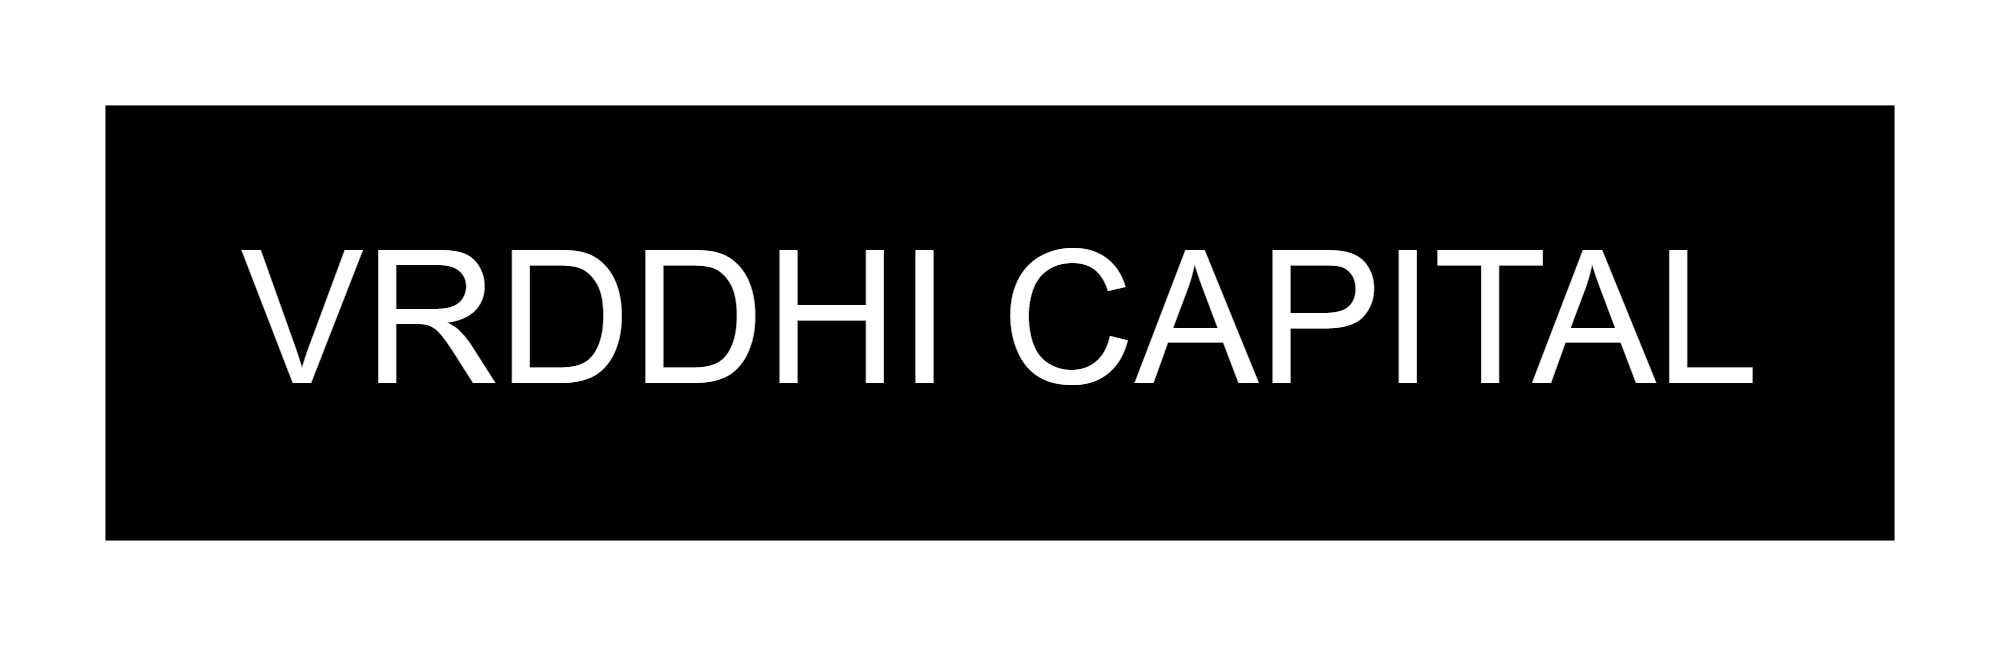 Vrddhi Capital